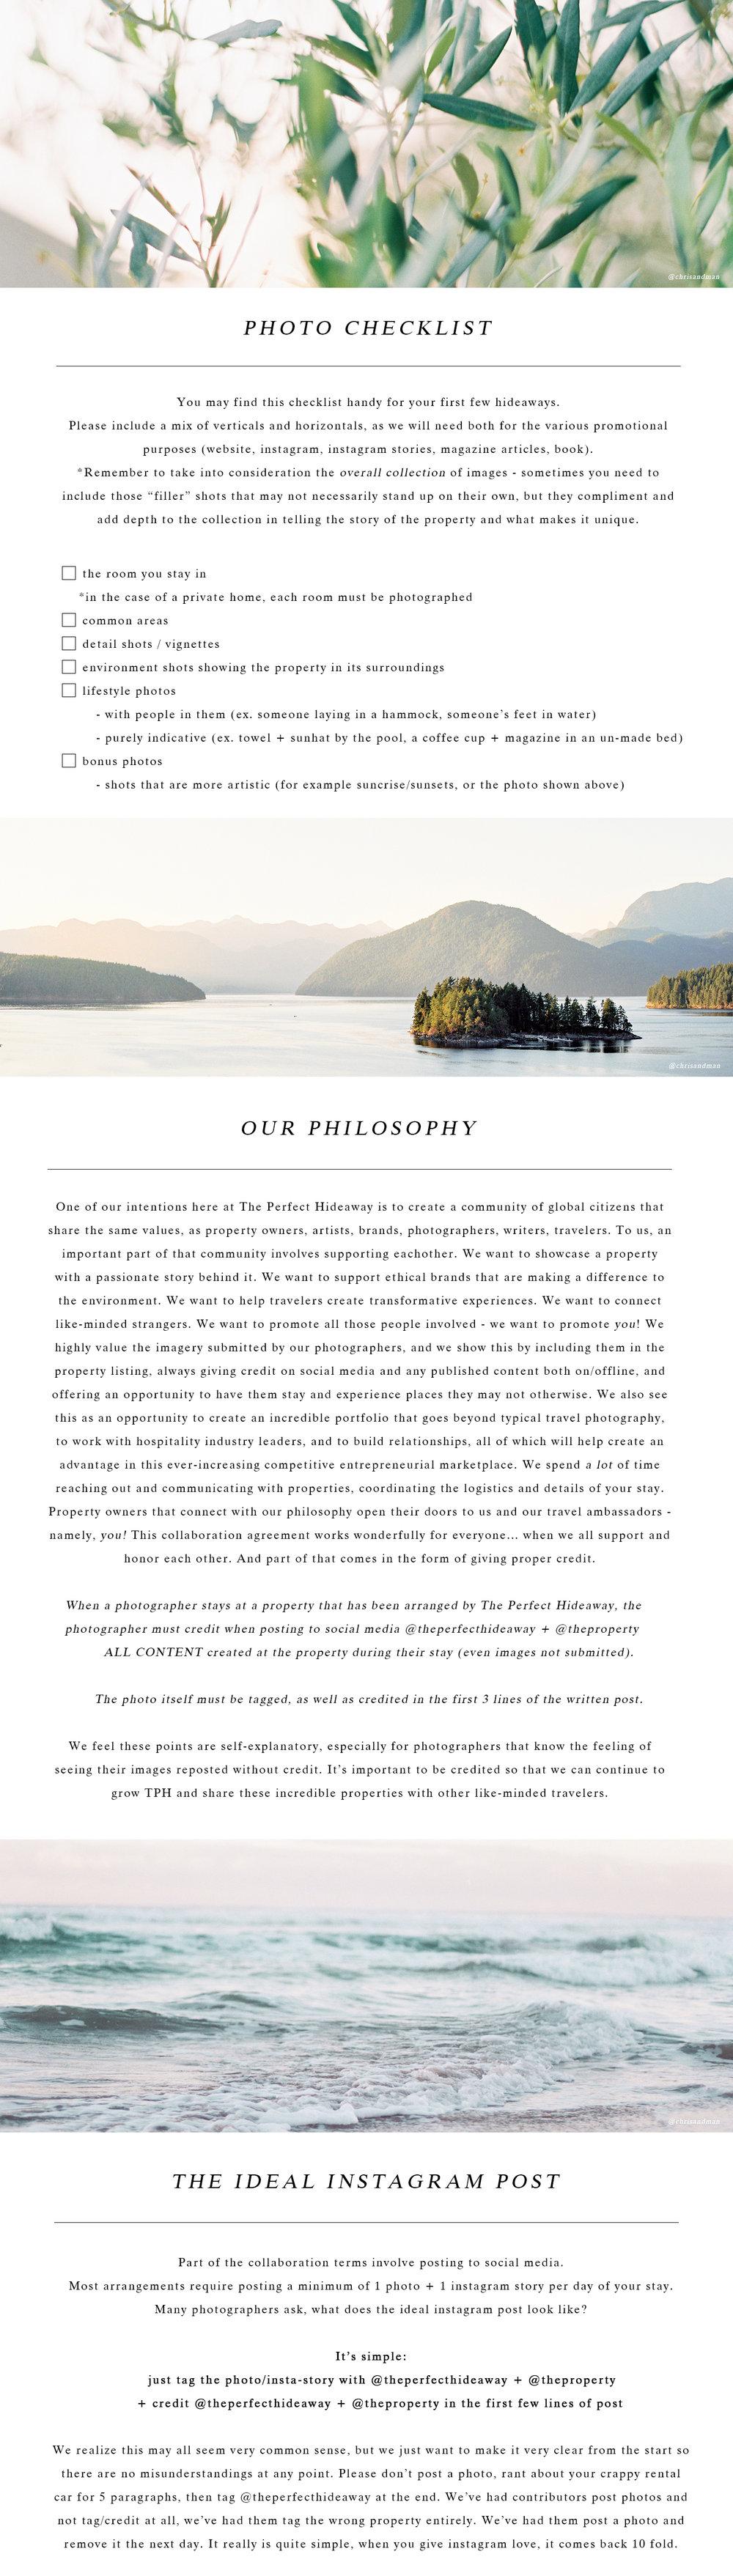 GuidelinesandPolicy2-photographers.jpg